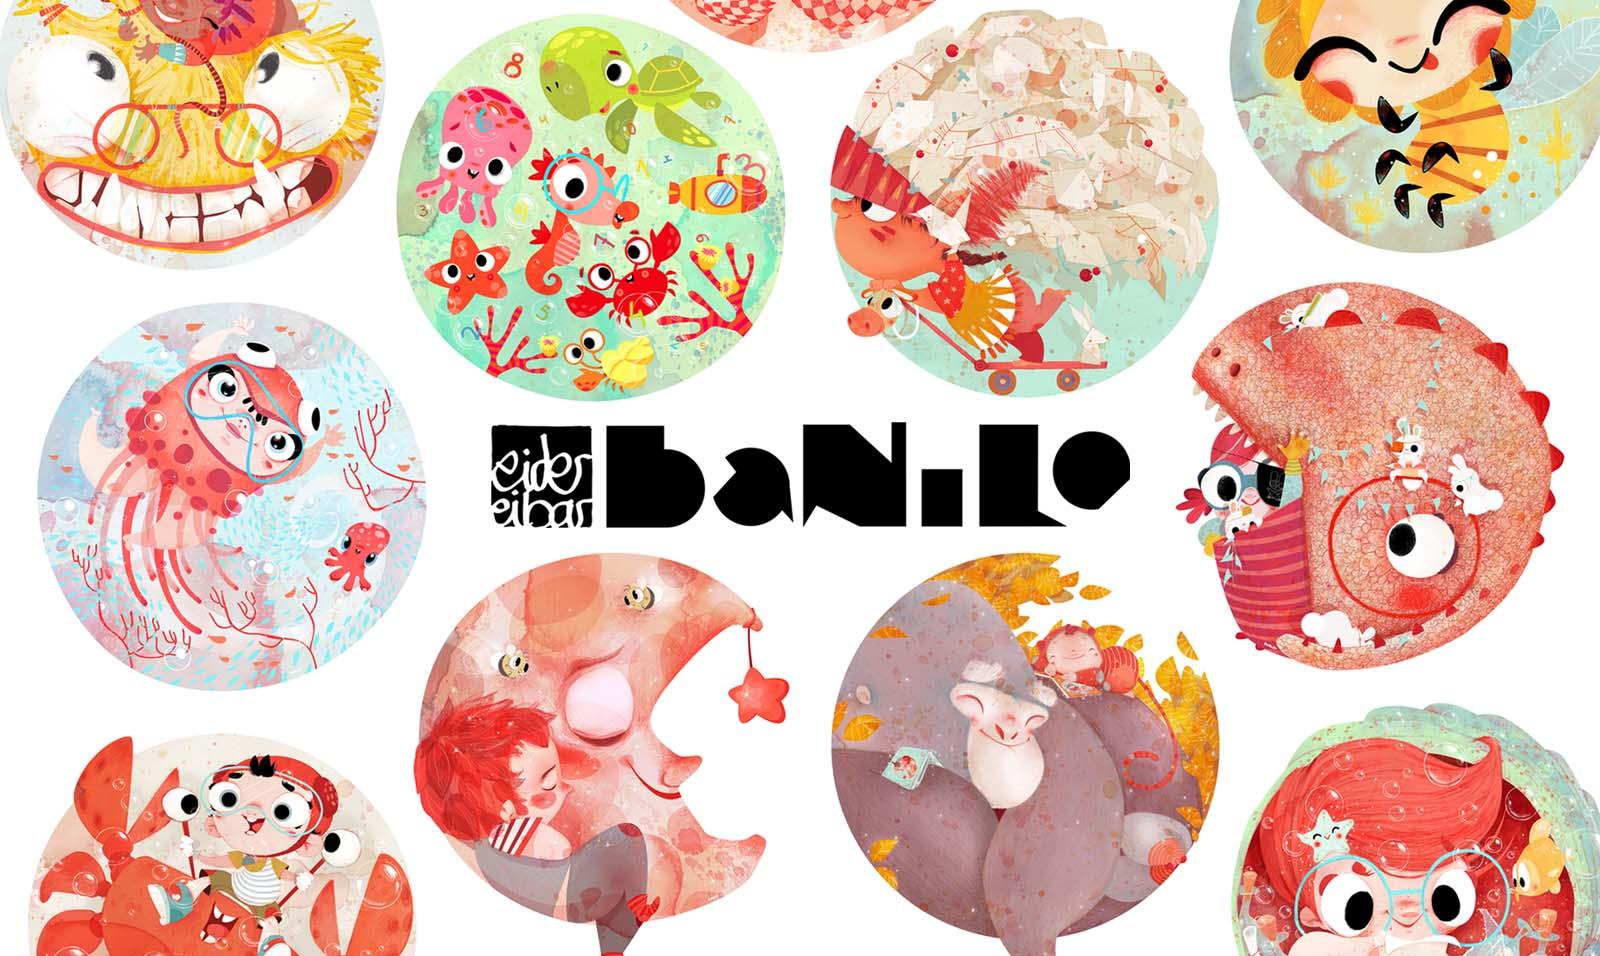 Banilo_sarrera_01